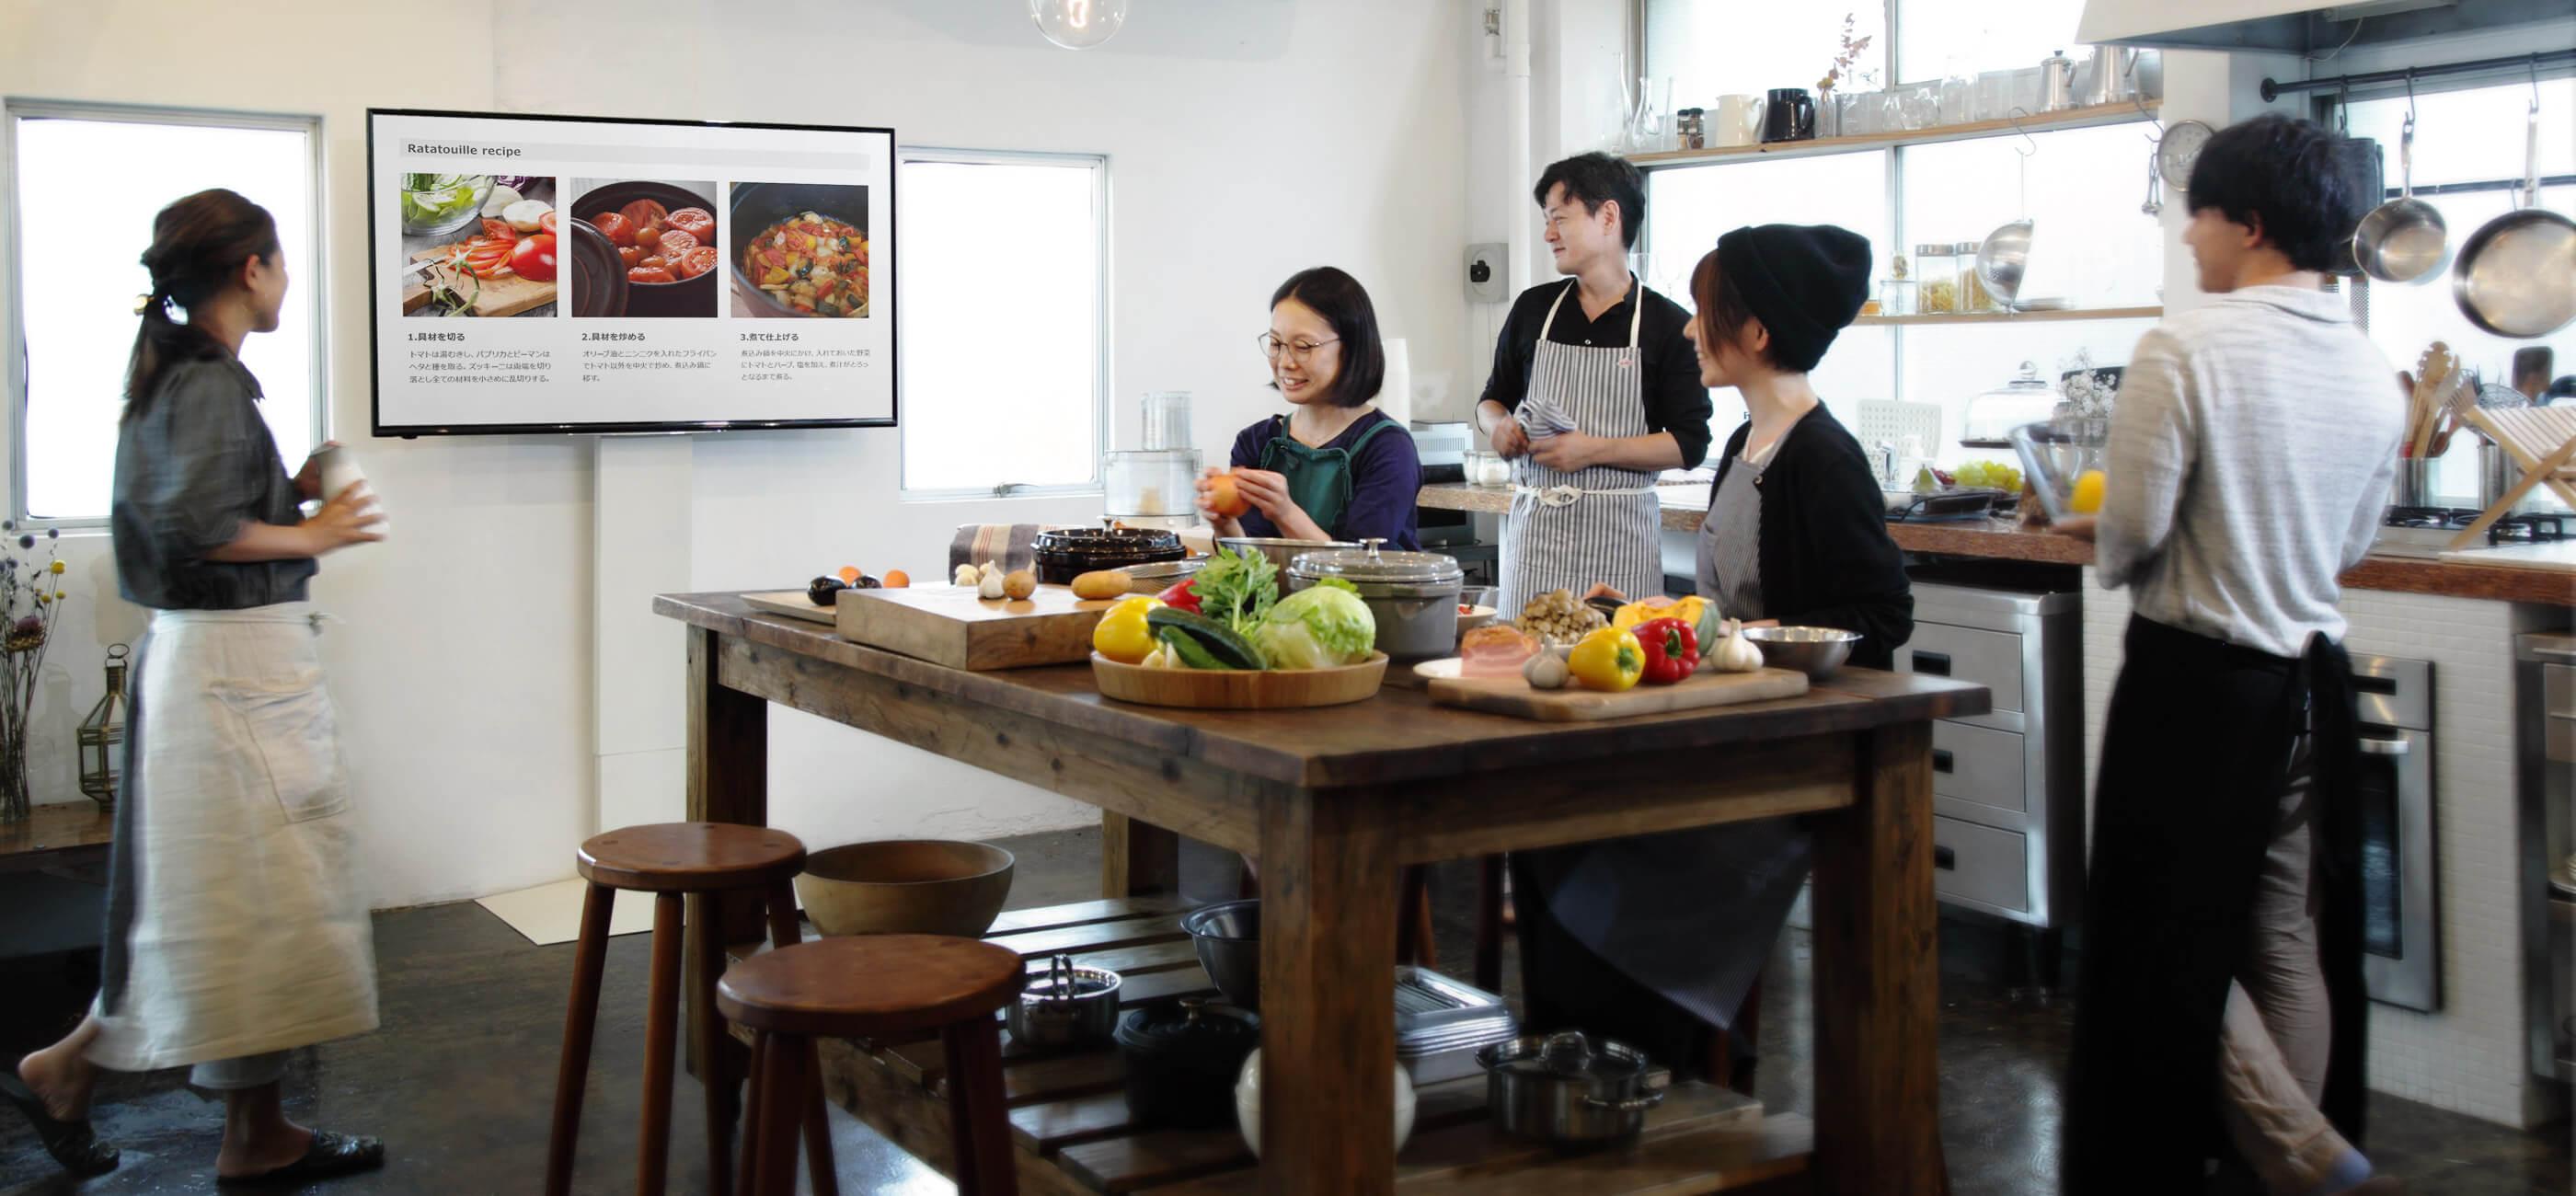 WALL INTERIOR TV STAND V3 壁寄せテレビスタンドV3 スタイル